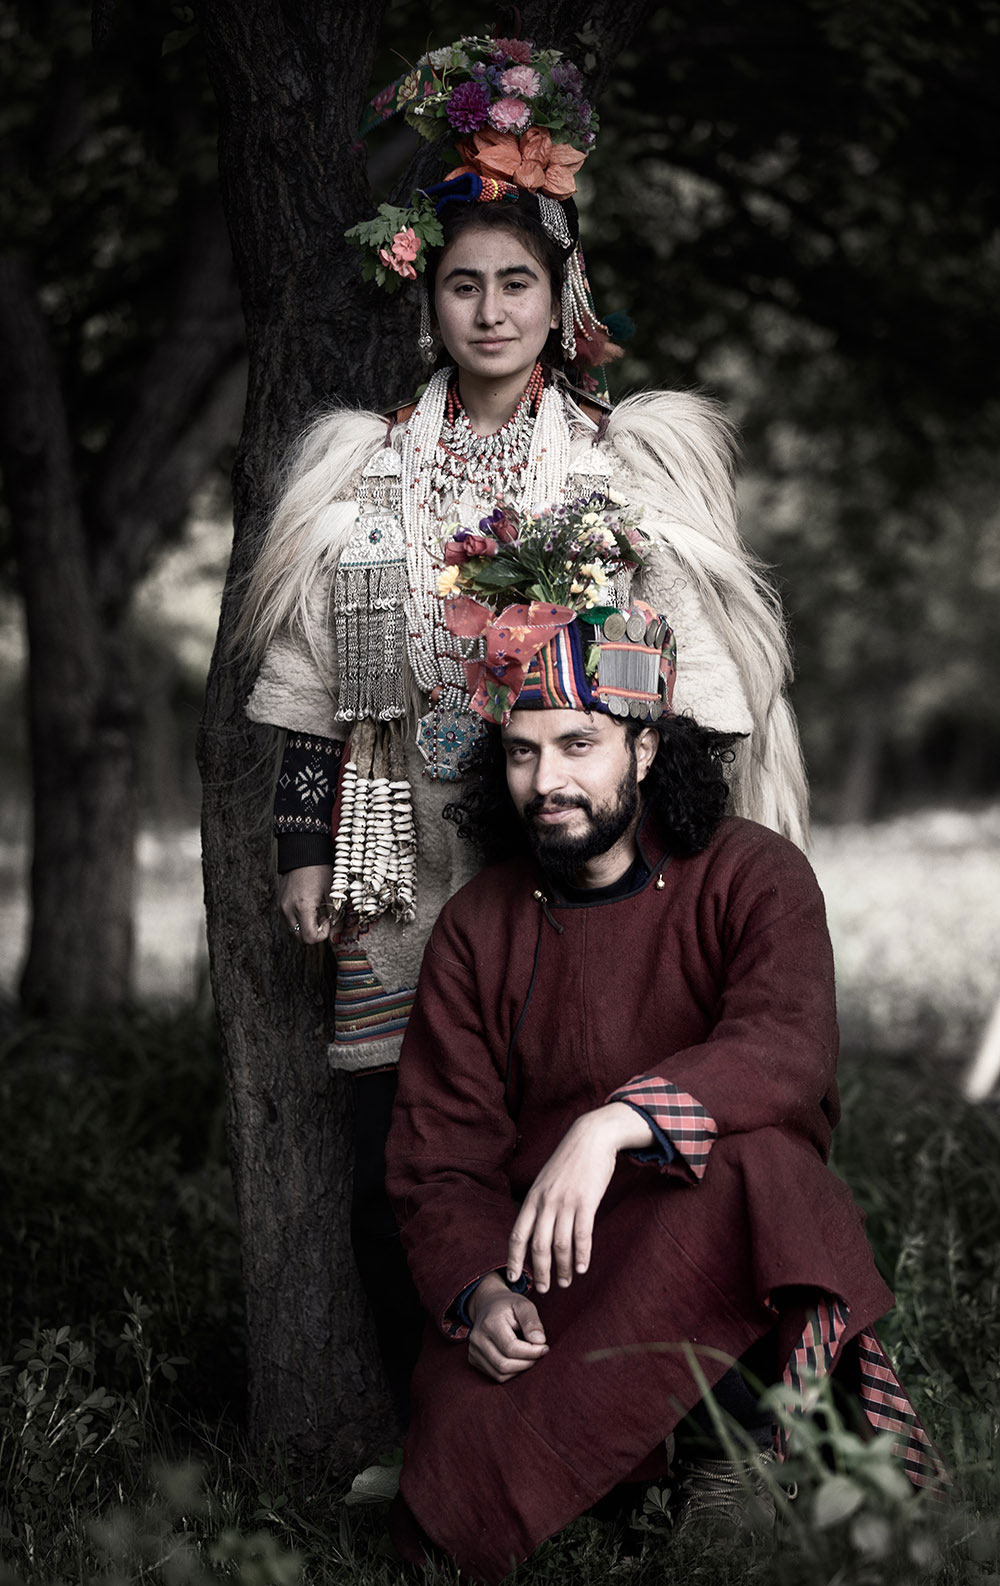 The dark tribe | Aga Szydlik